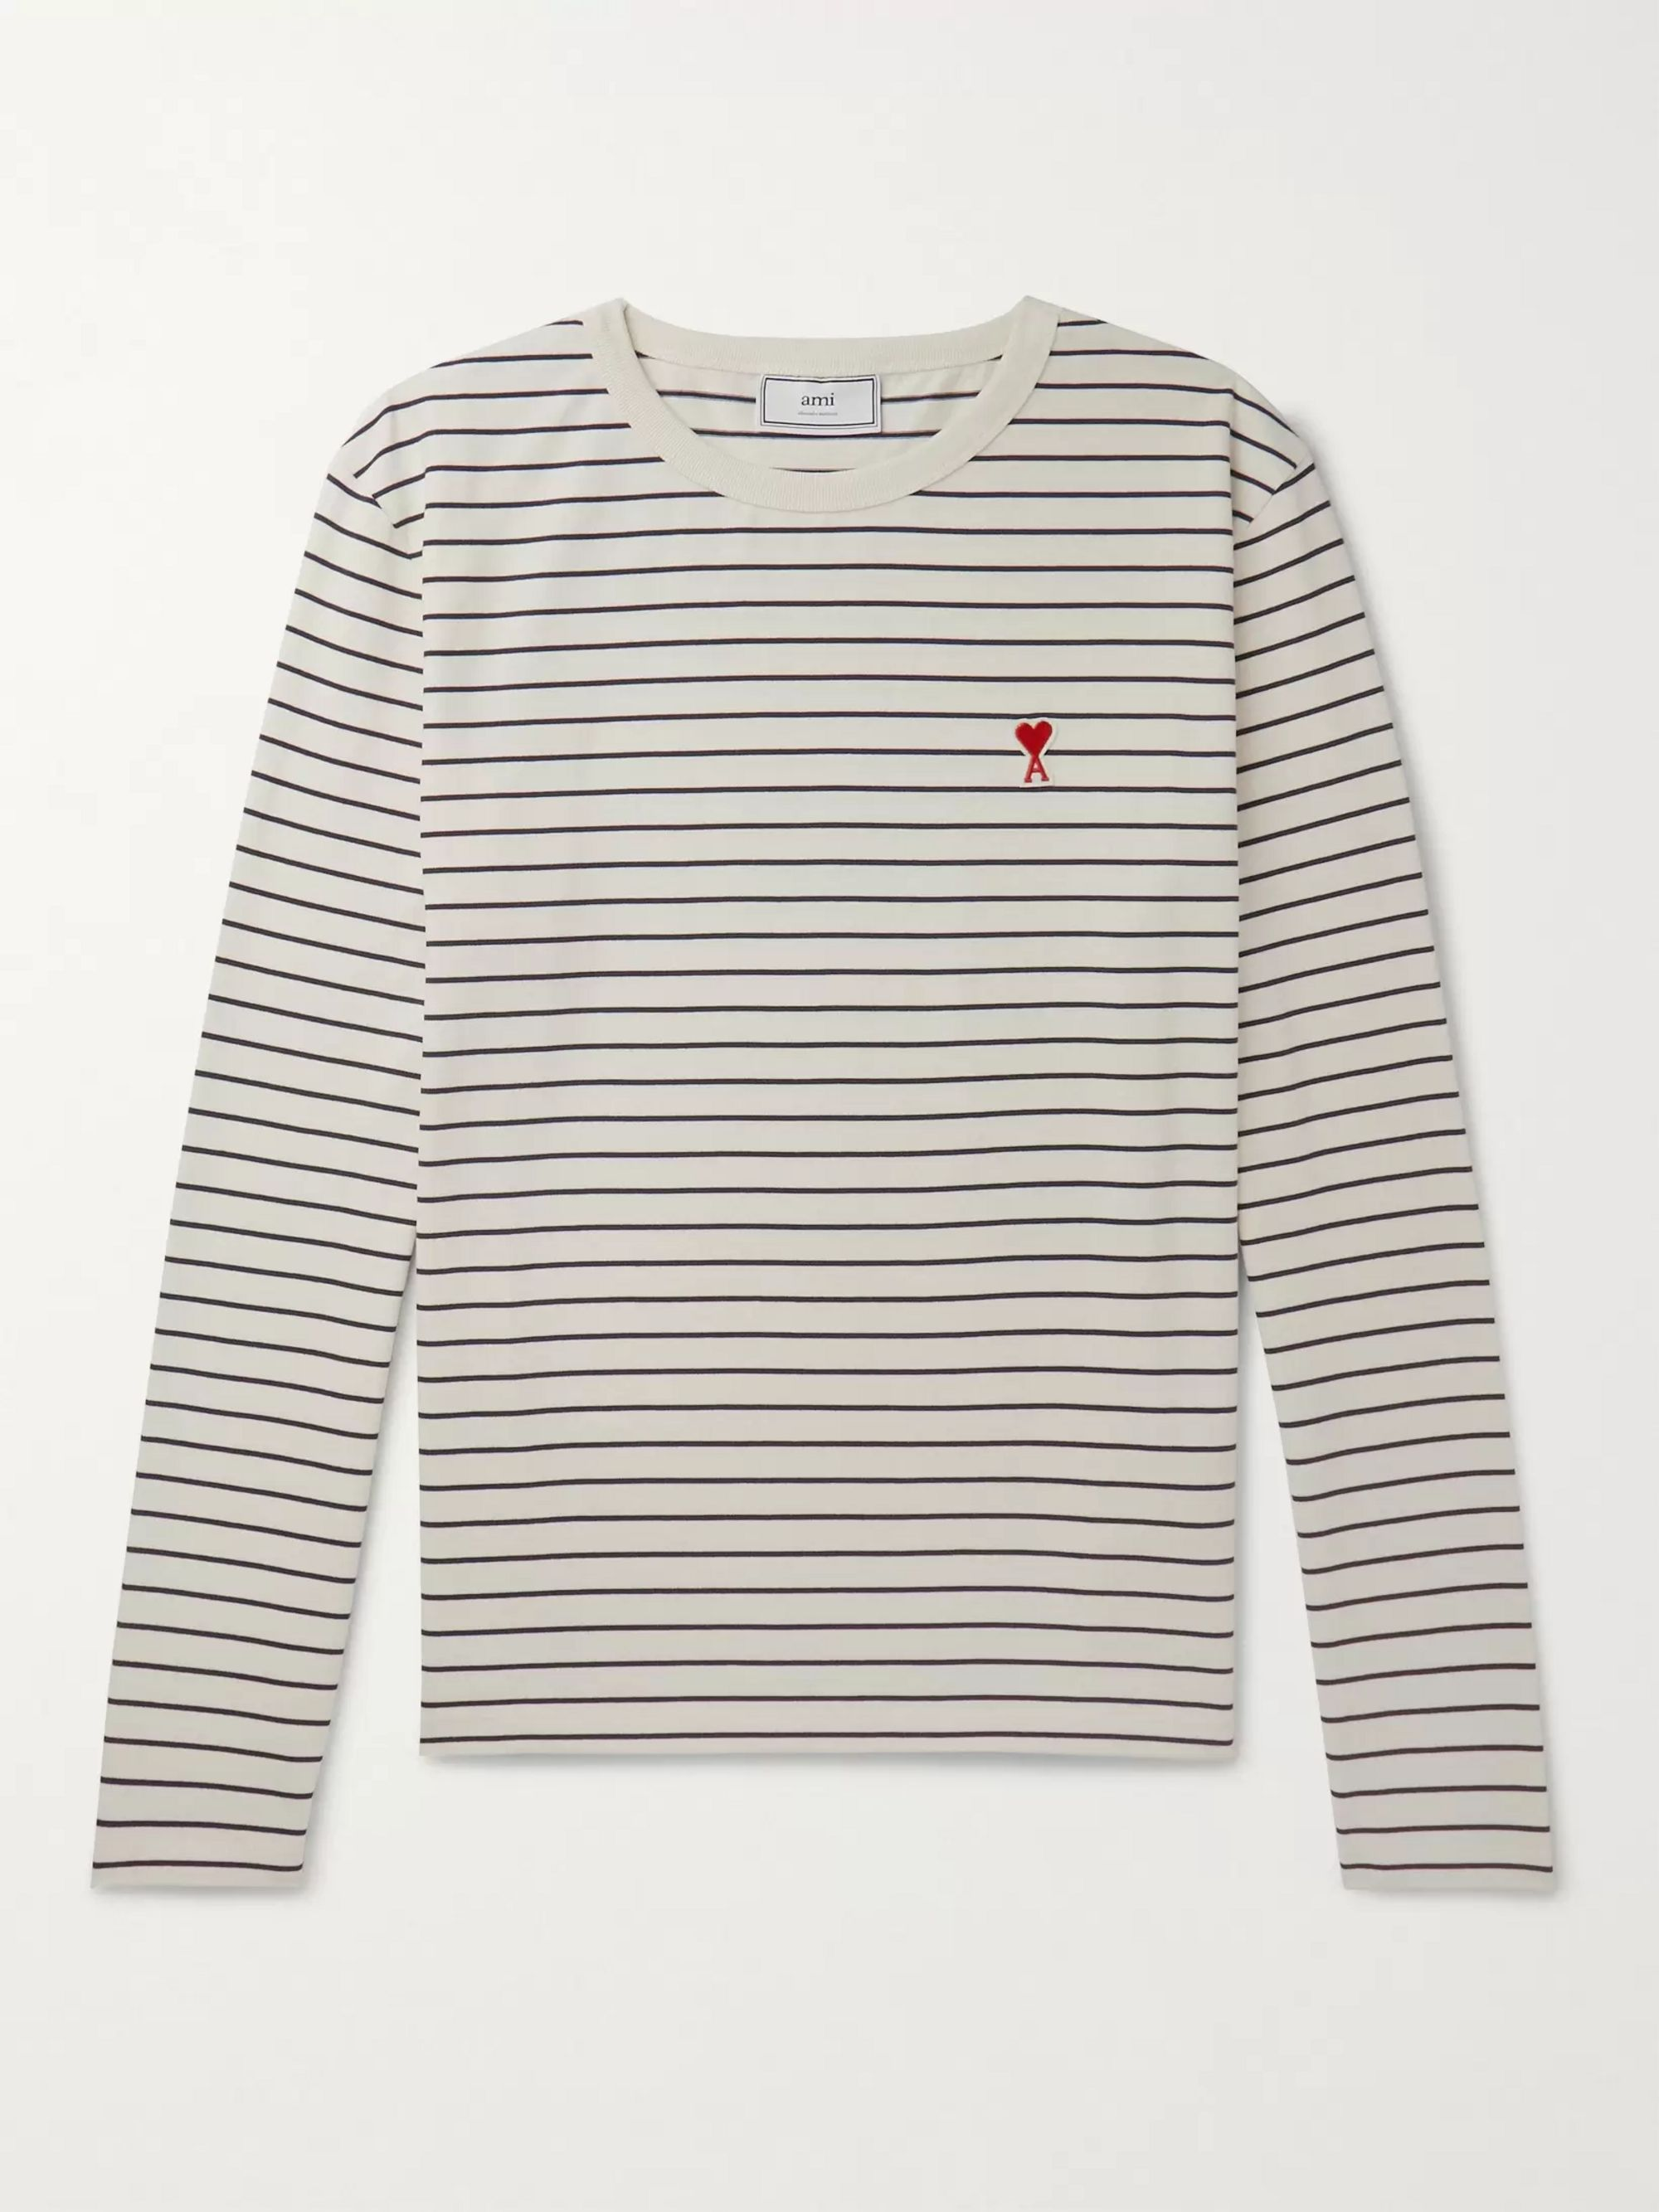 Heart appliqué Cotton jersey T shirt